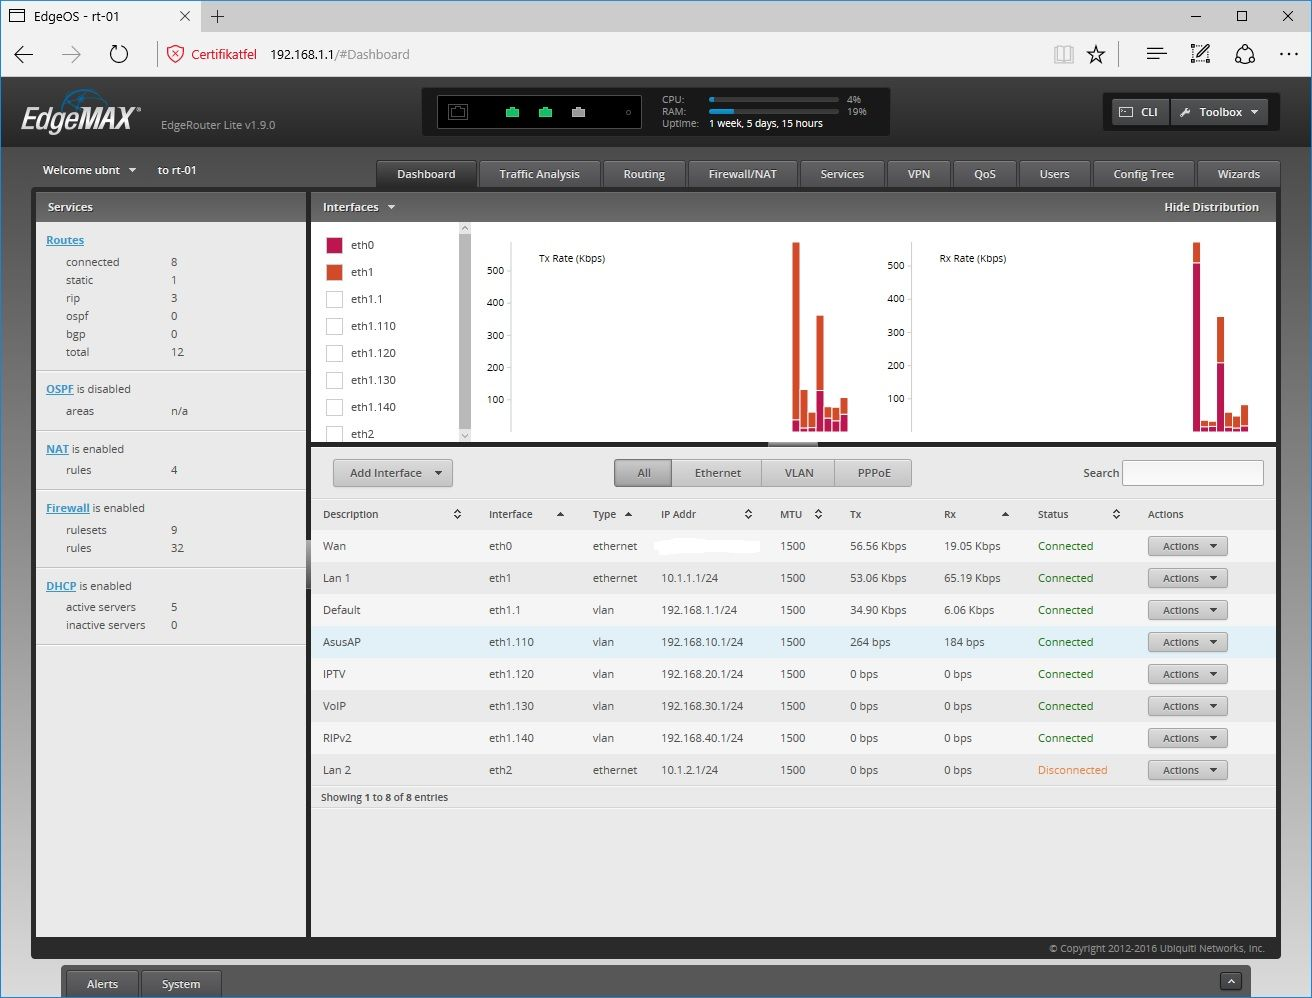 VLAN Setup Not Working - Edgerouter Lite / HP Procurve